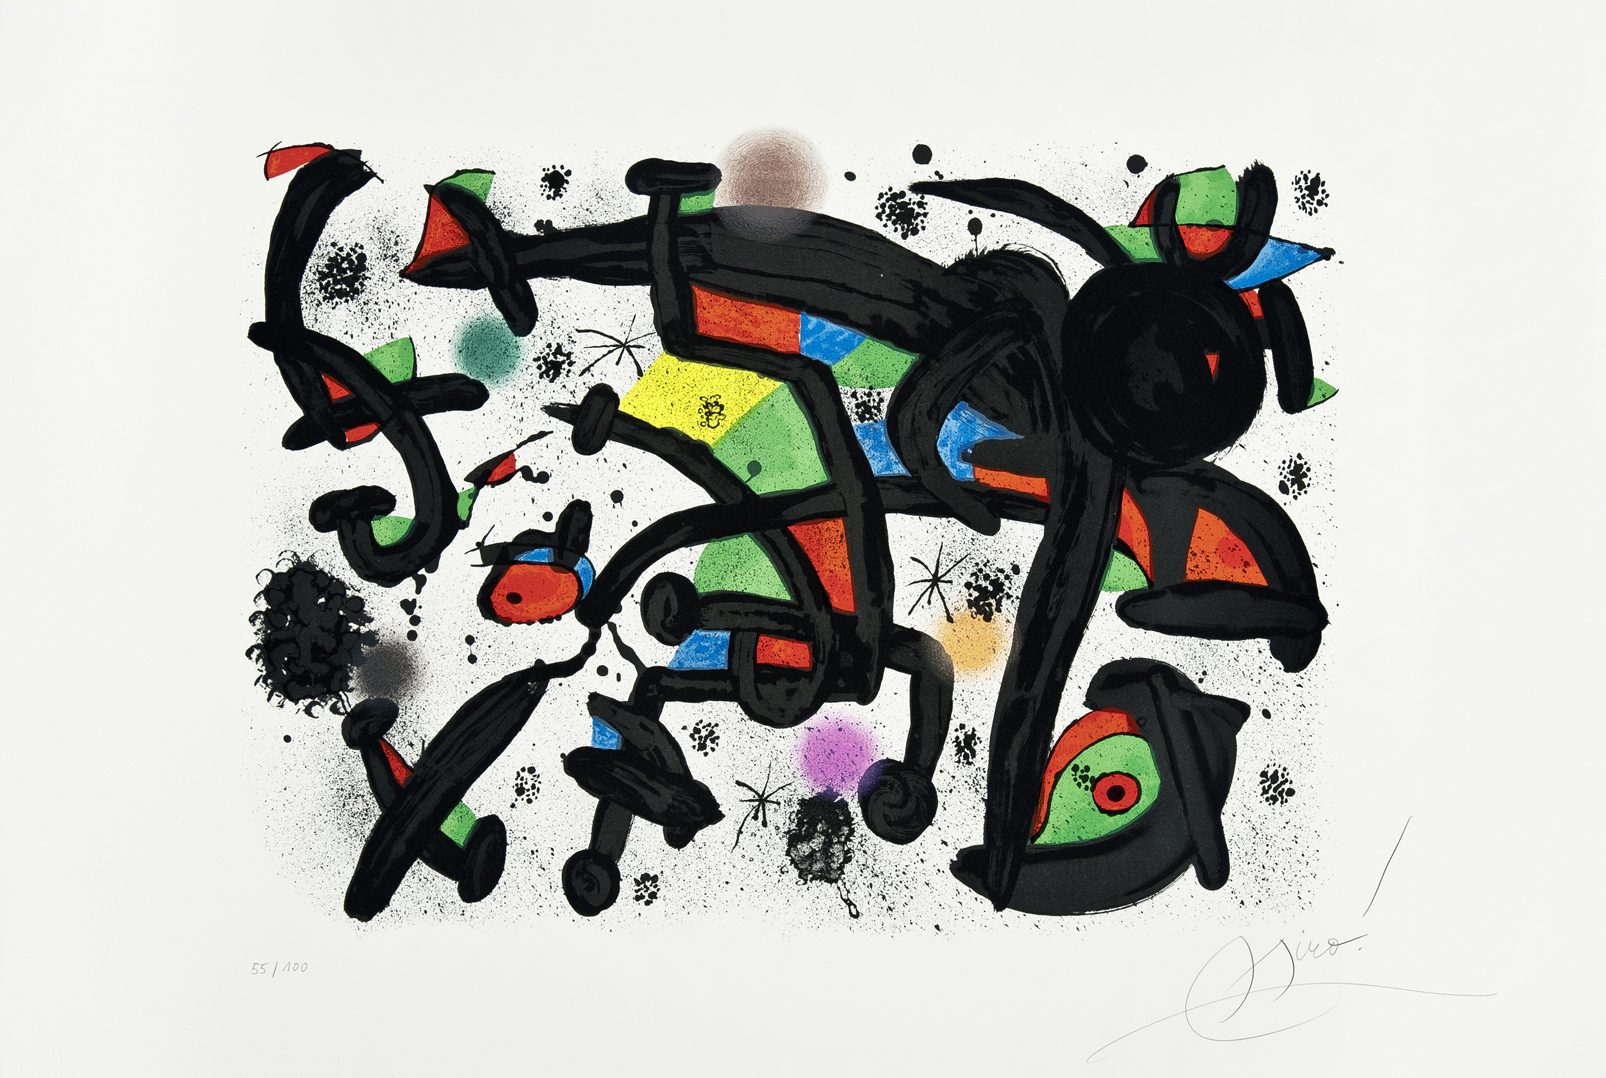 Joan Miro Artiste Galerie Lelong Co